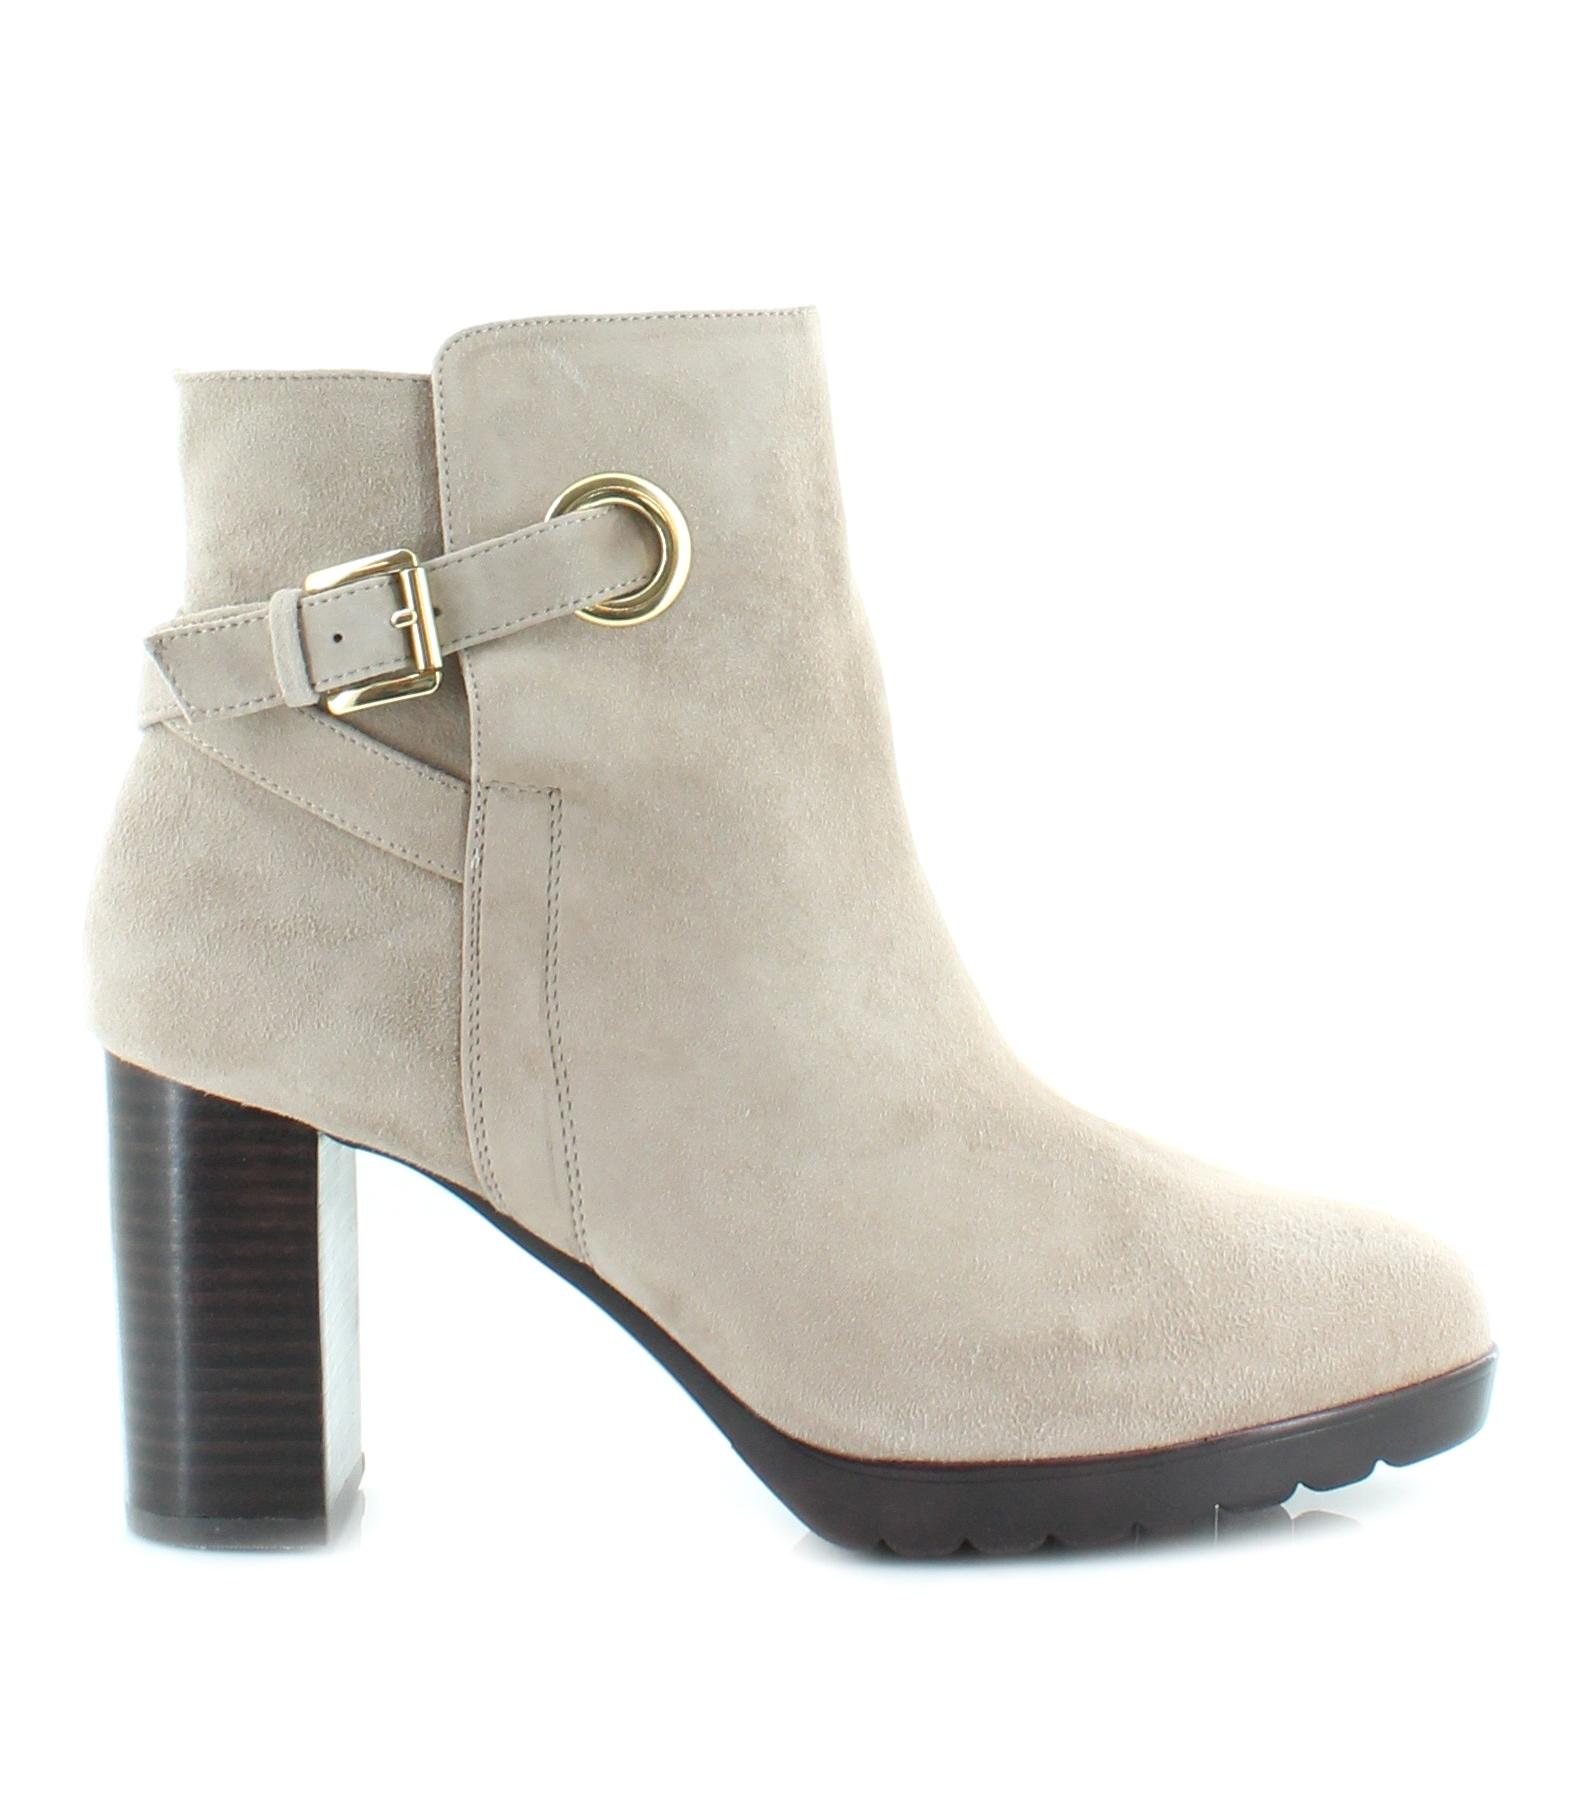 Bella Vita Zelda Women's Boots Almond Size 11 N by Bella Vita